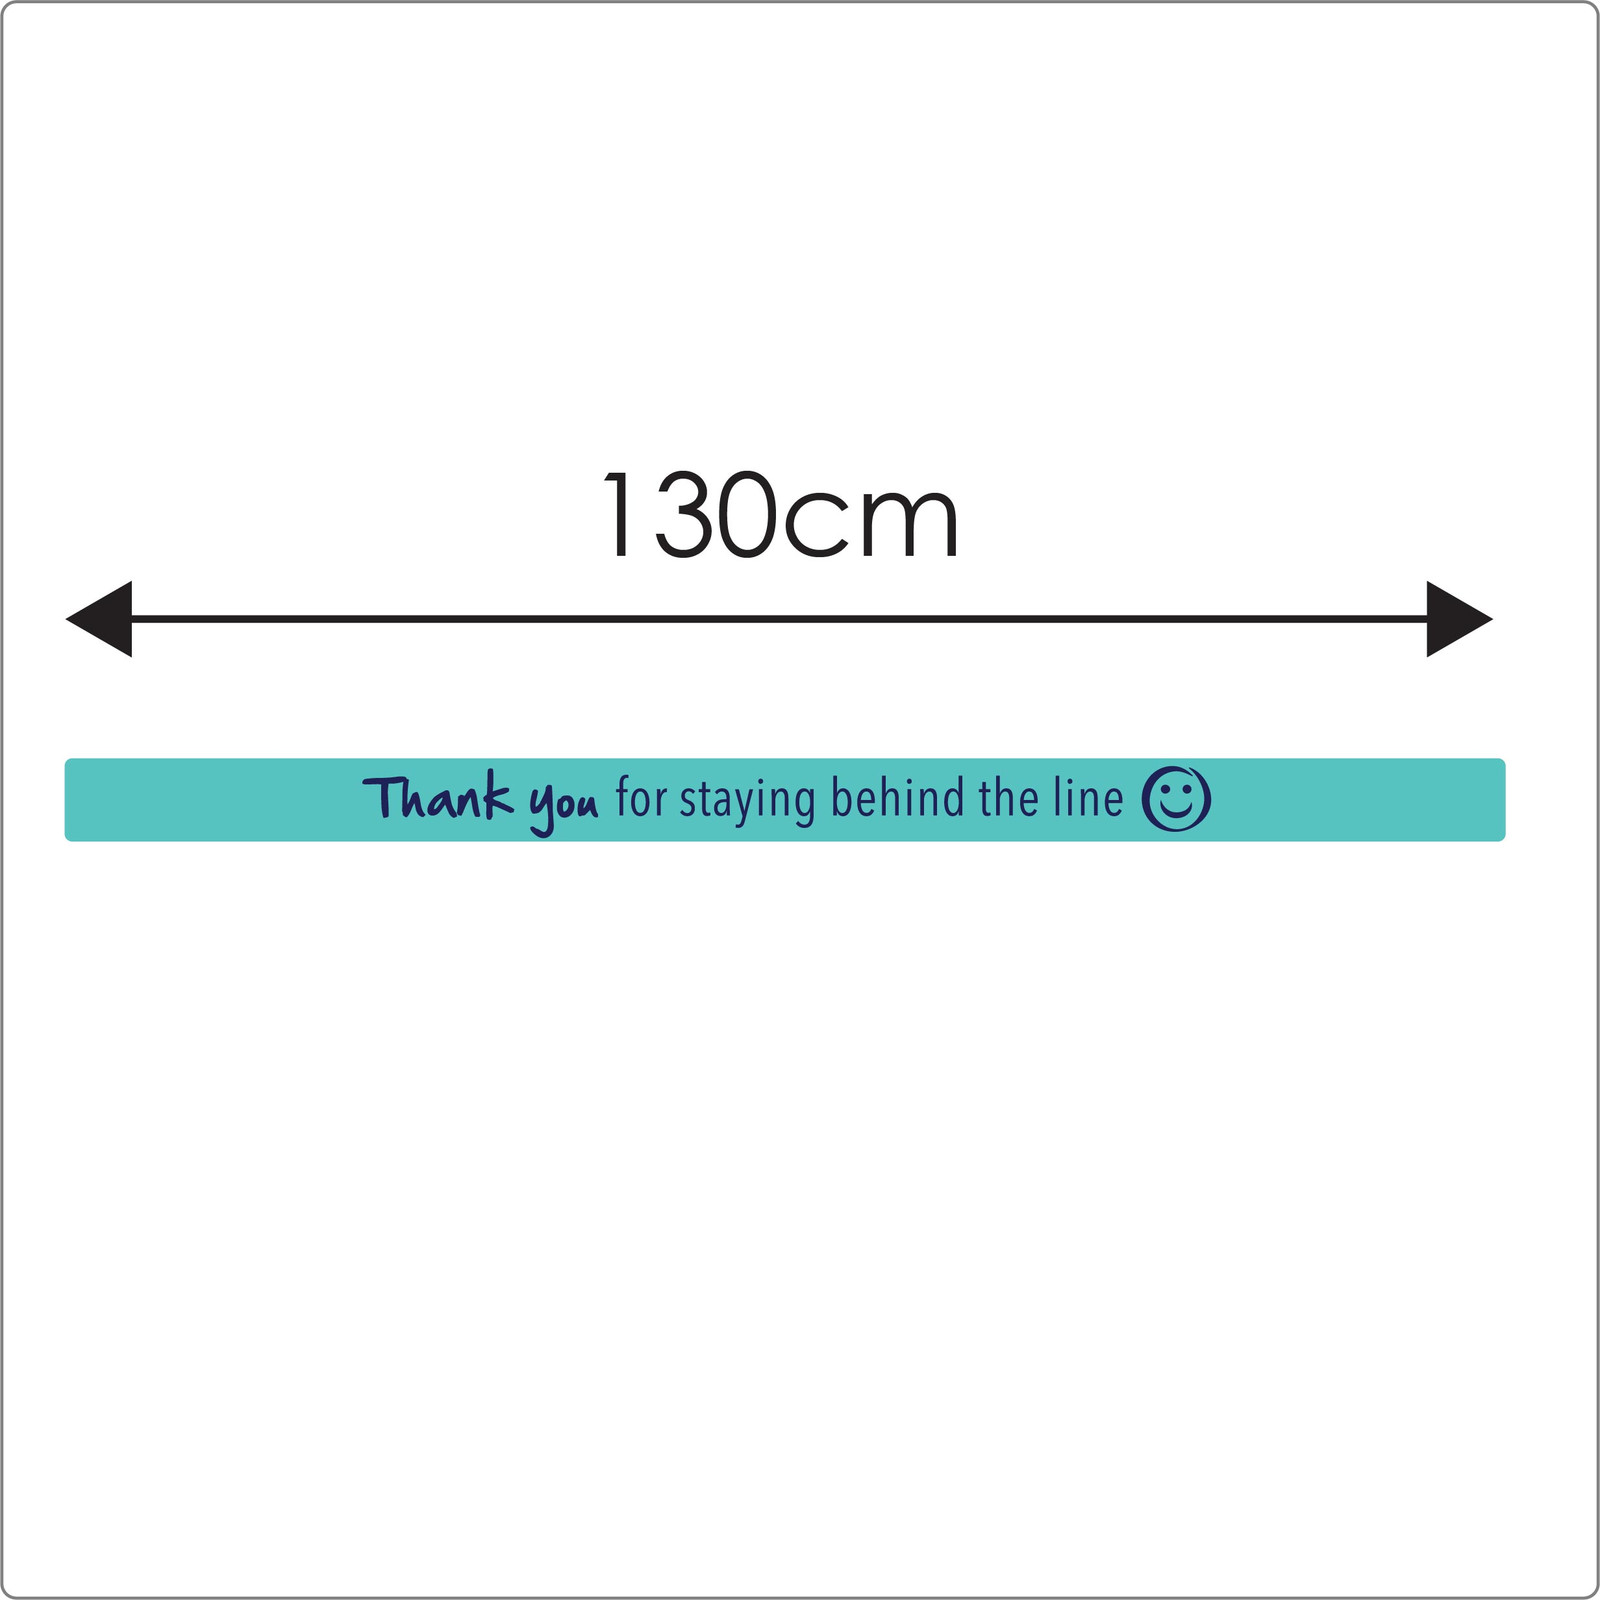 social distancing floor sticker for carpet, 2 lines, teal, sizing  Self-adhesive Corona virus floor sticker to help social distancing.